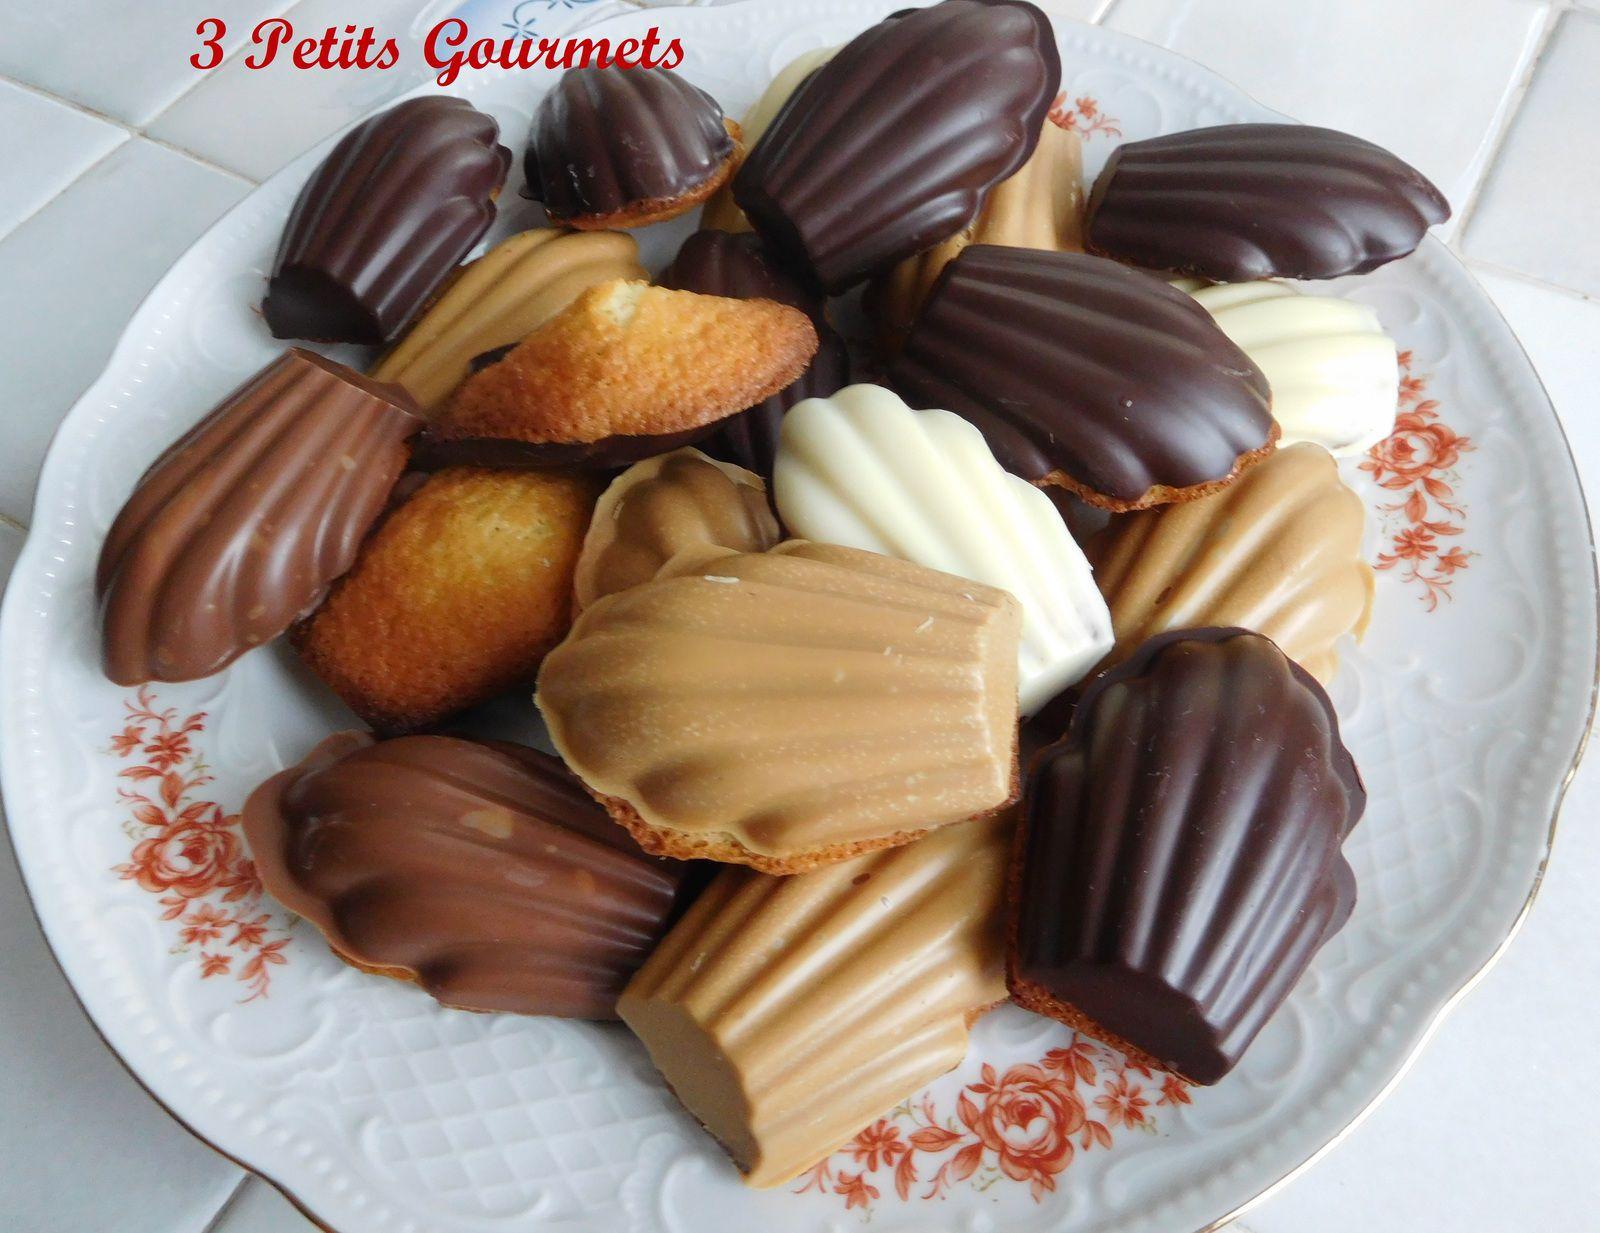 Des madeleines dans une jolie coque en chocolat.